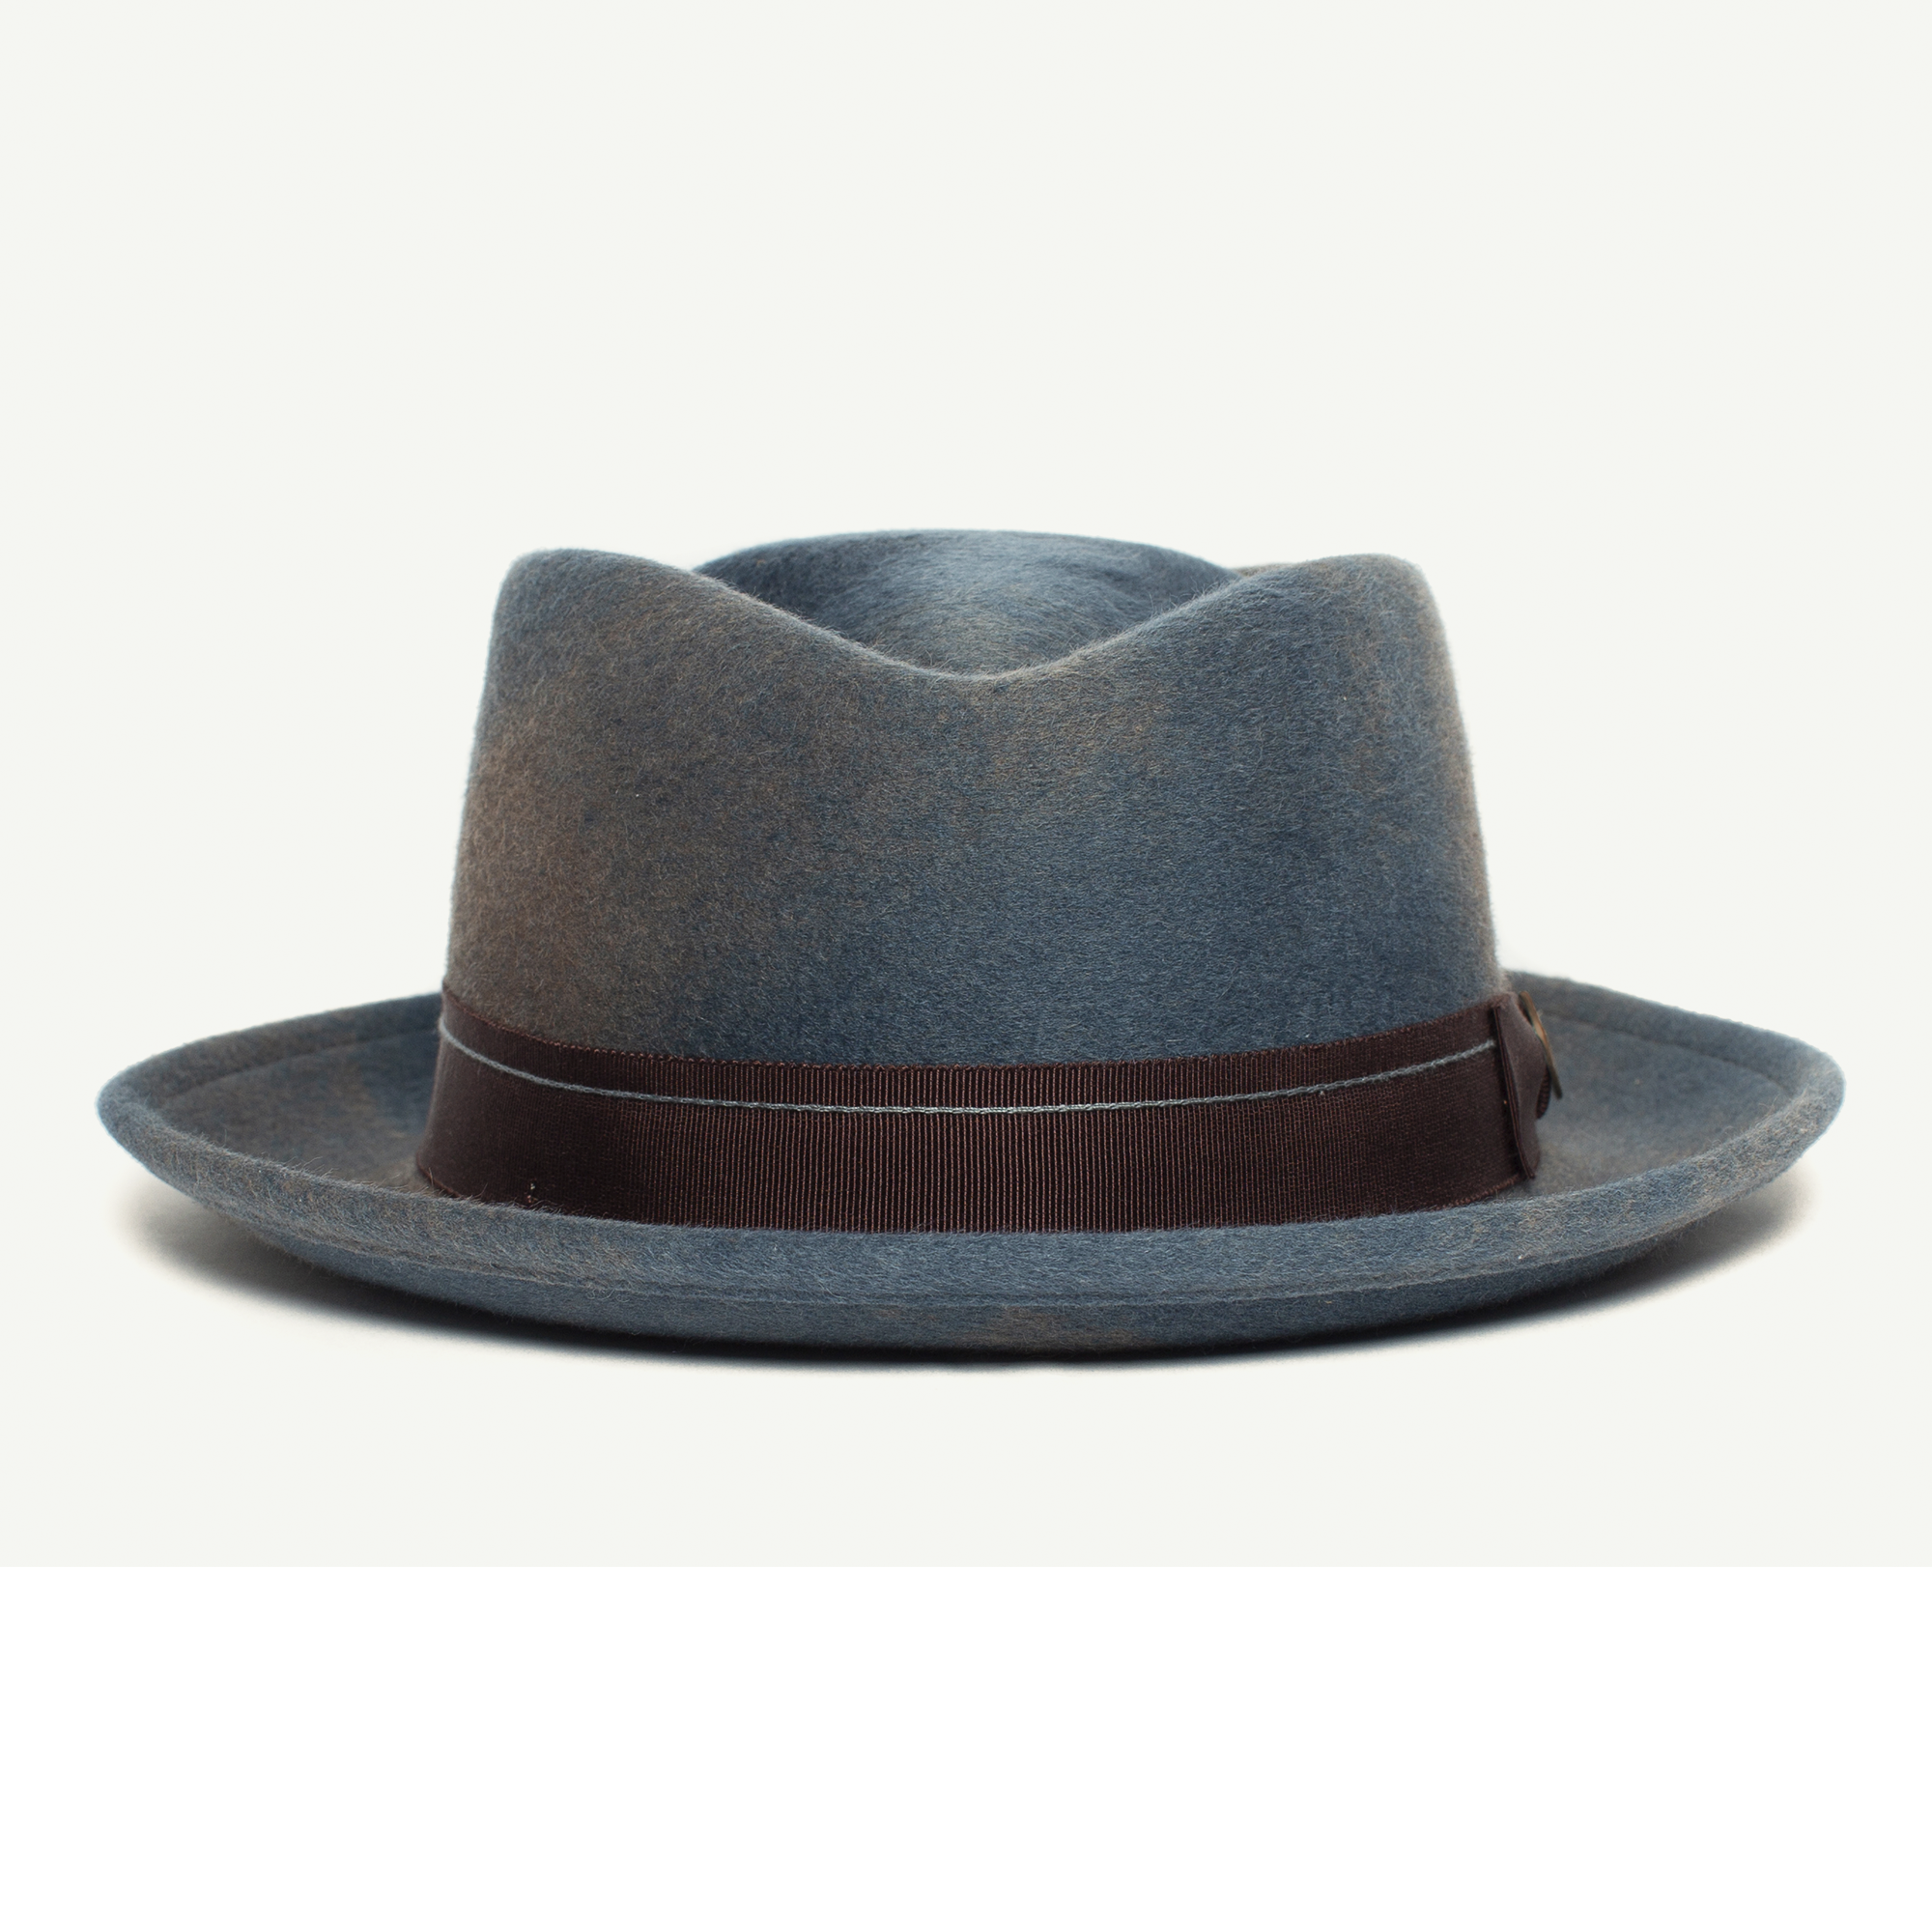 Note King Wool Pork Pie Women S Hat Made In America By Goorin Bros Hats For Men Pork Pie Hat Hats For Women